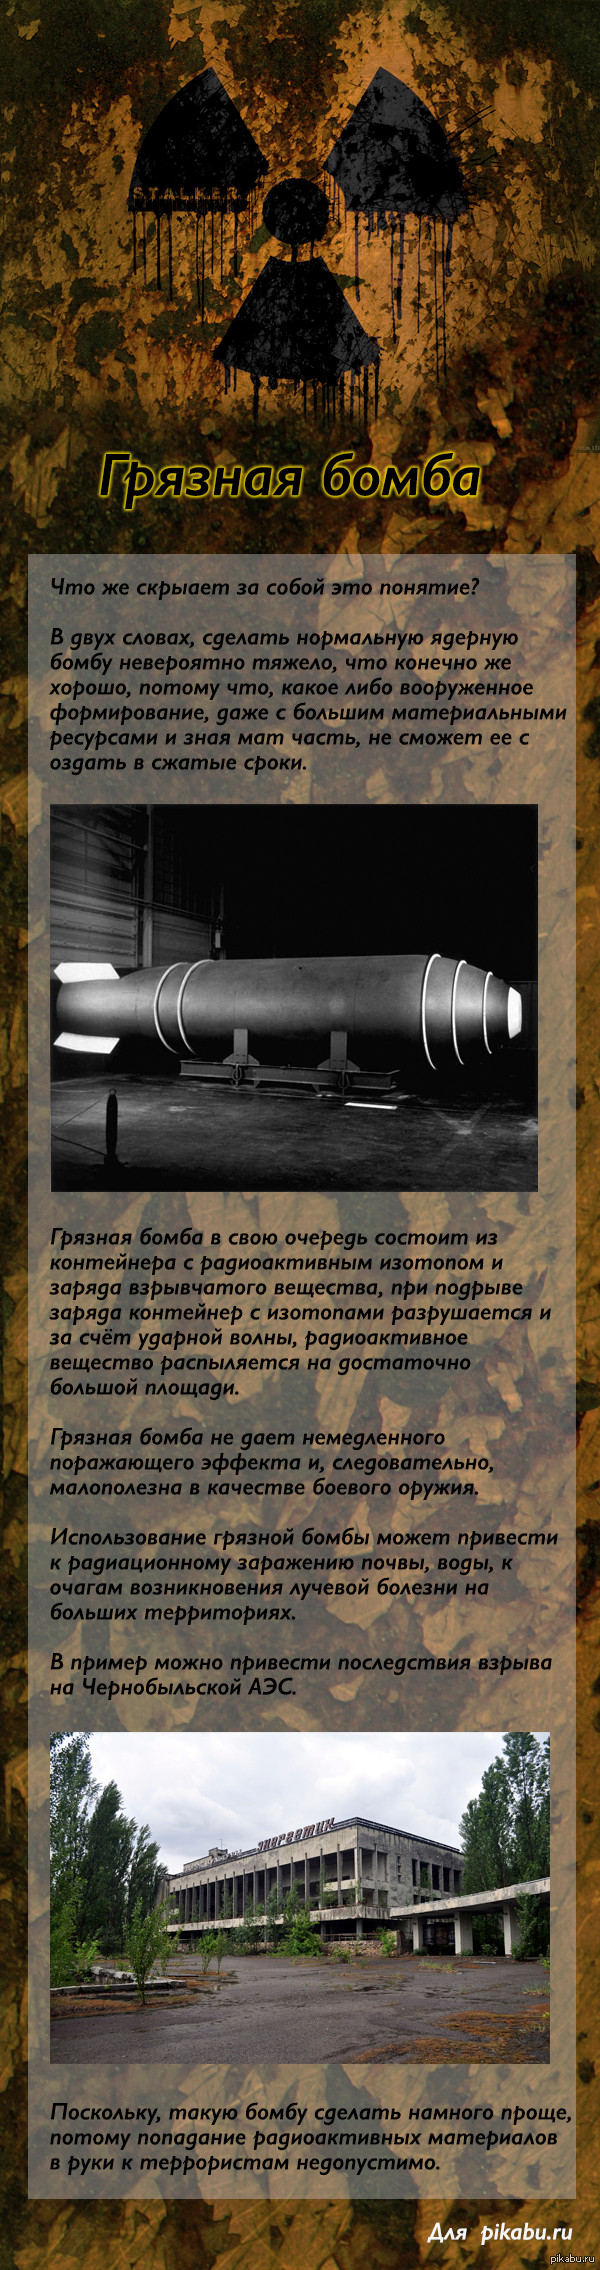 Грязная бомба